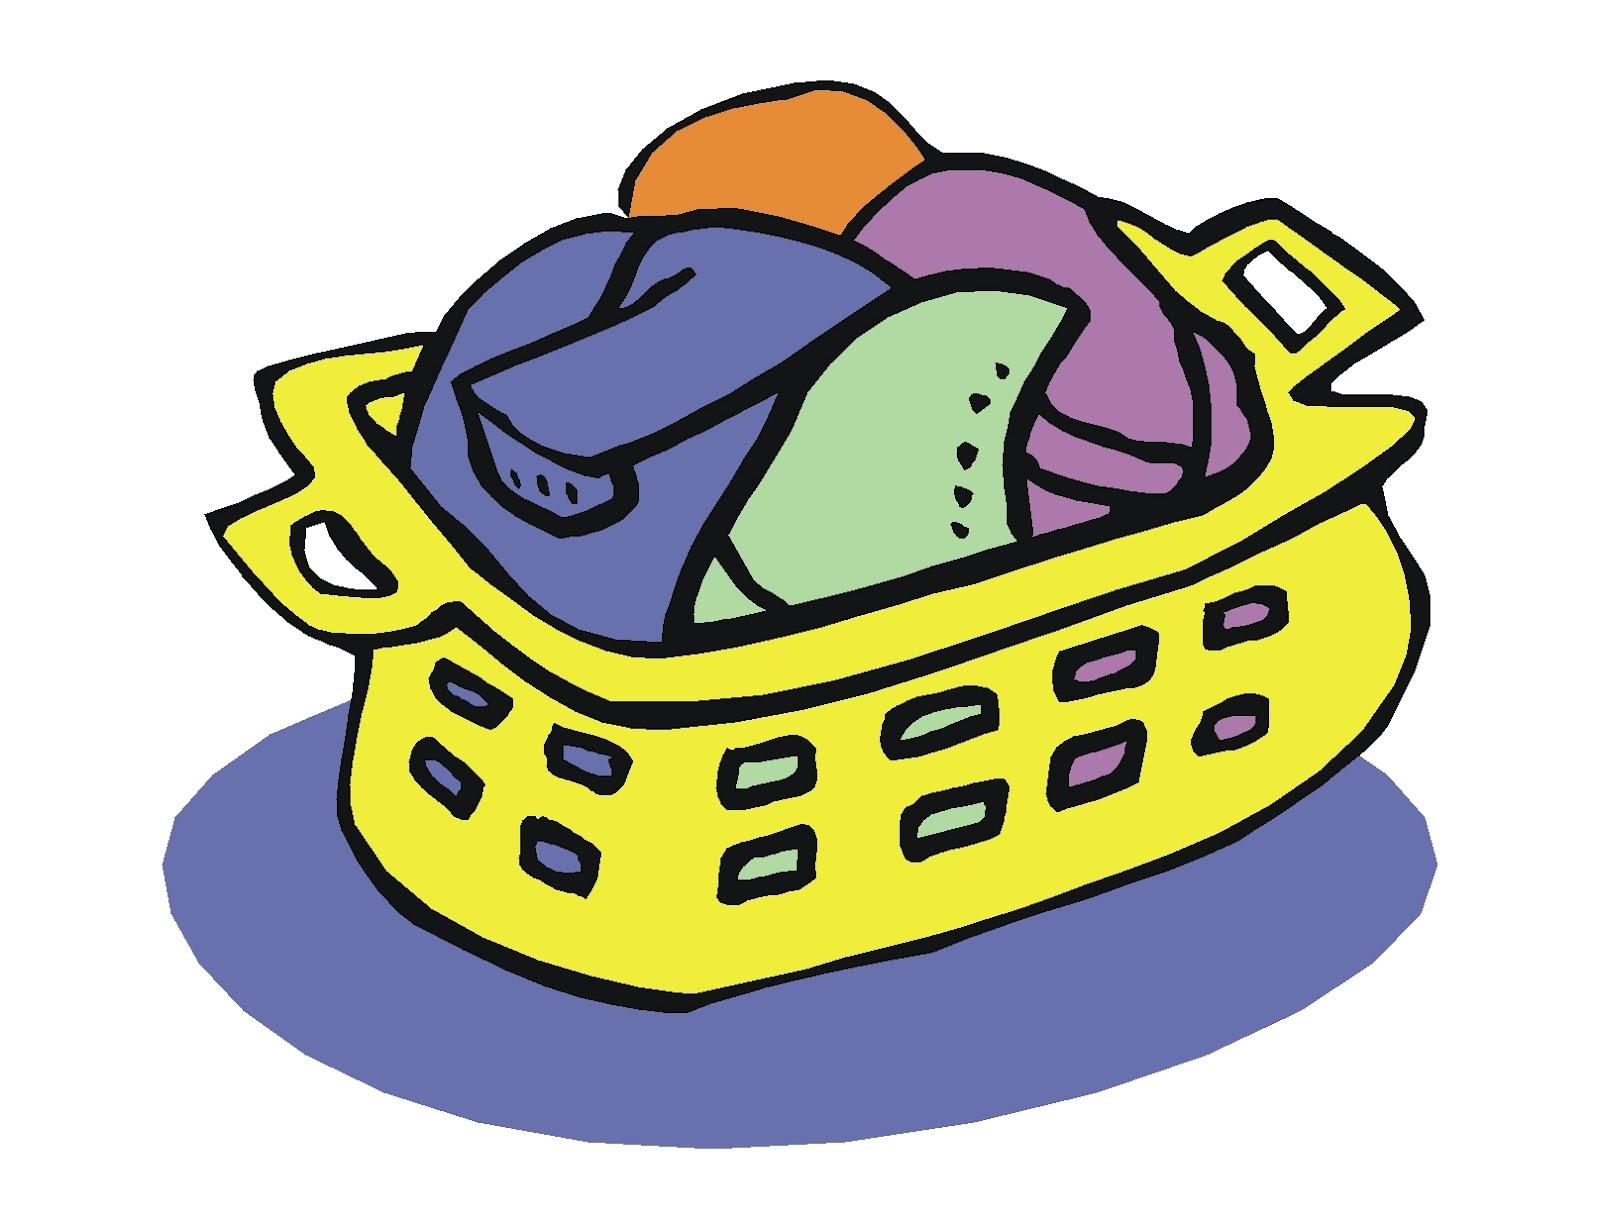 Laundry Basket Clipart.